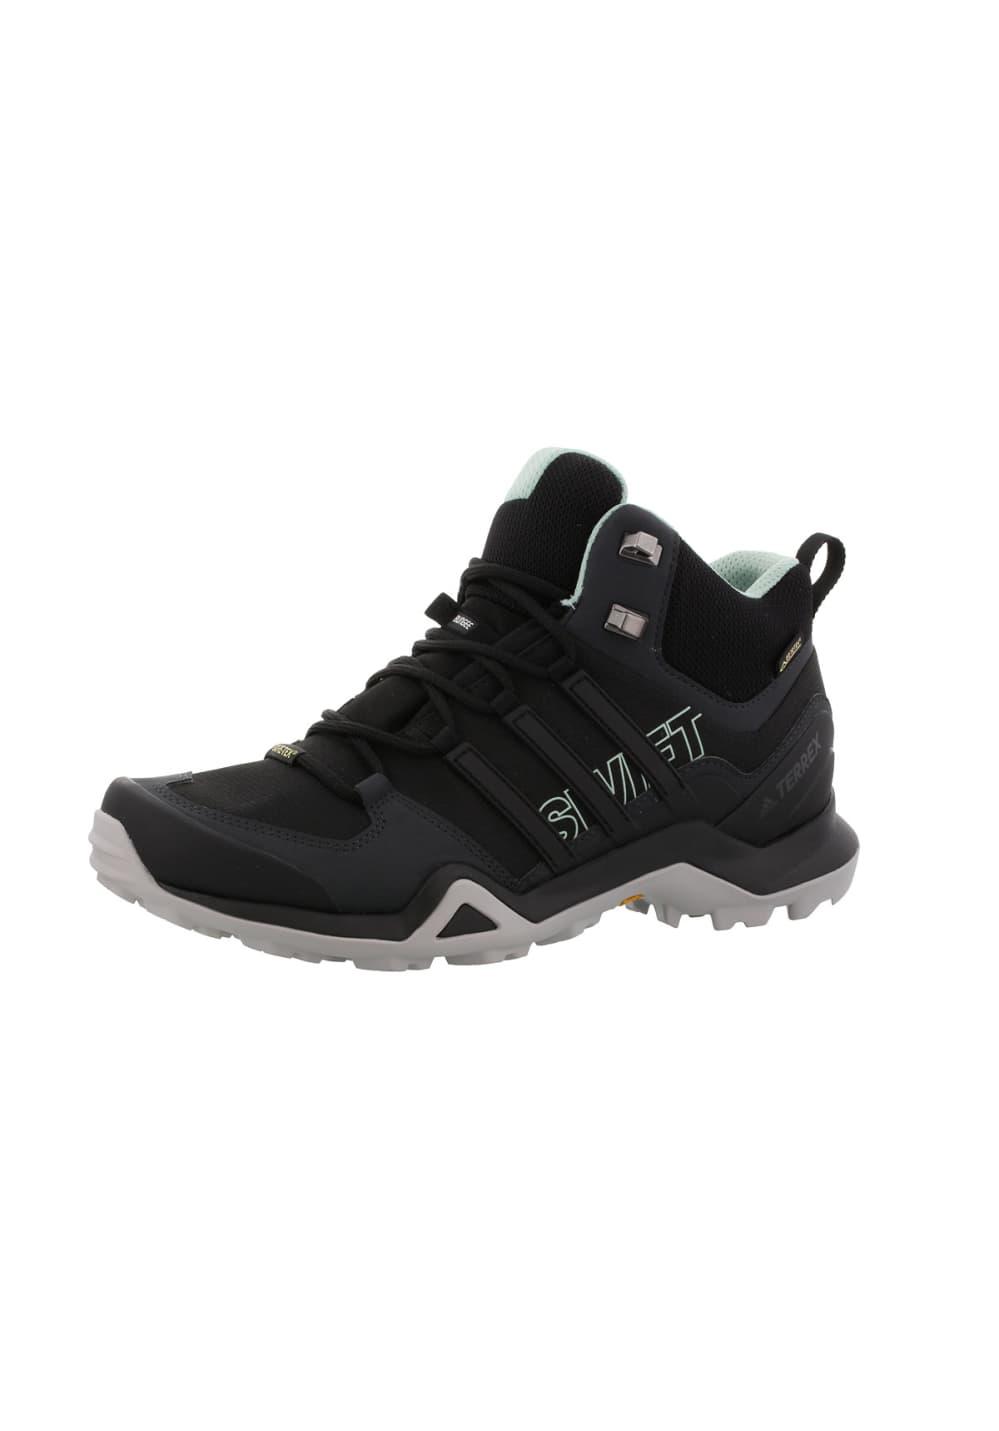 Swift Adidas Randonnée Pour Chaussures Gtx Mid R2 Terrex Noir Femme ygIbfY67vm